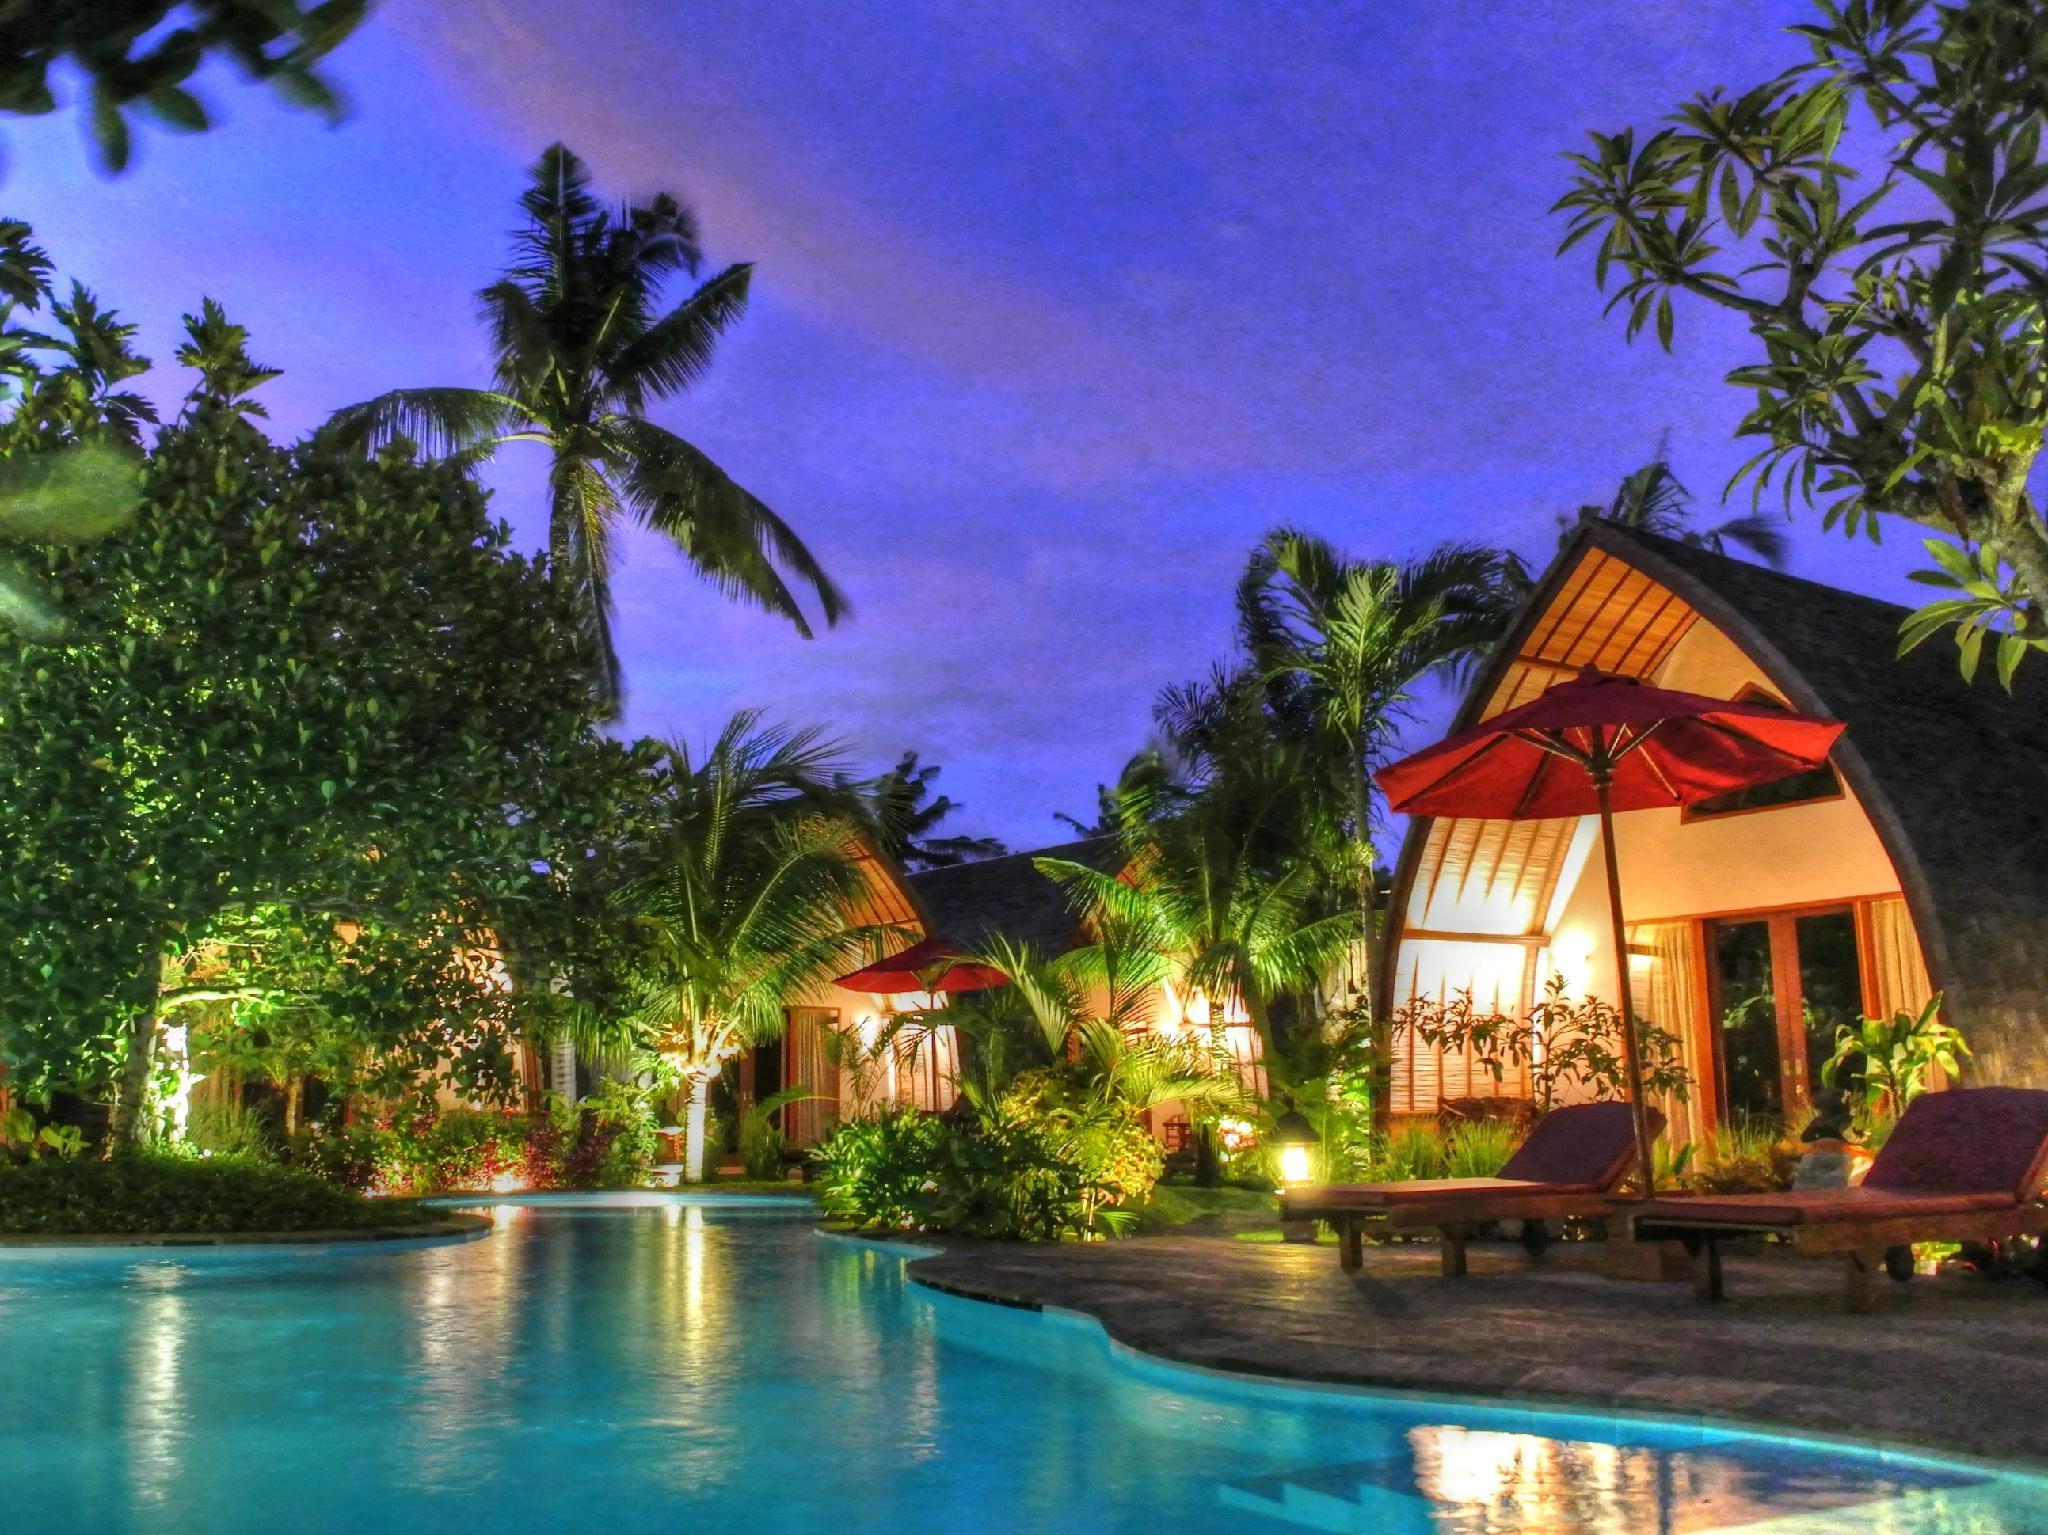 Klumpu Bali Resort